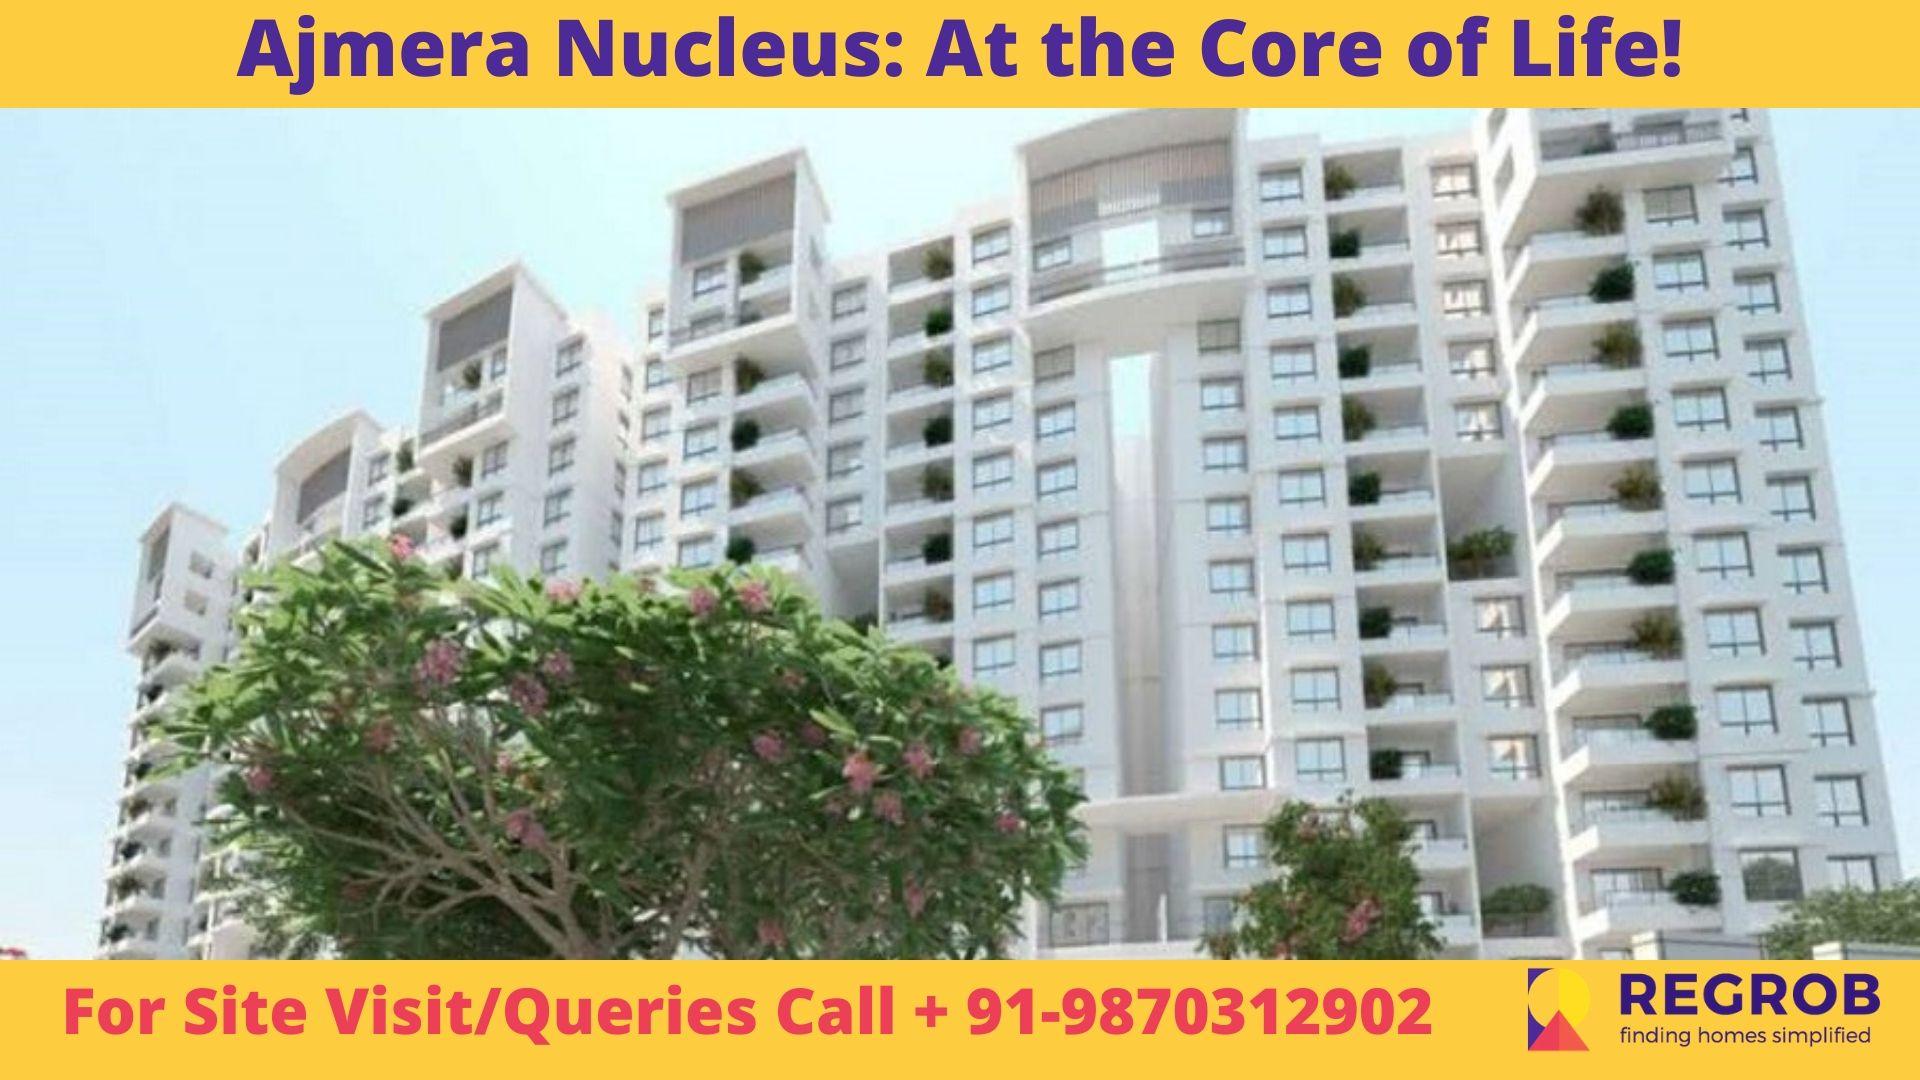 Ajmera Nucleus_ At the Core of Life!